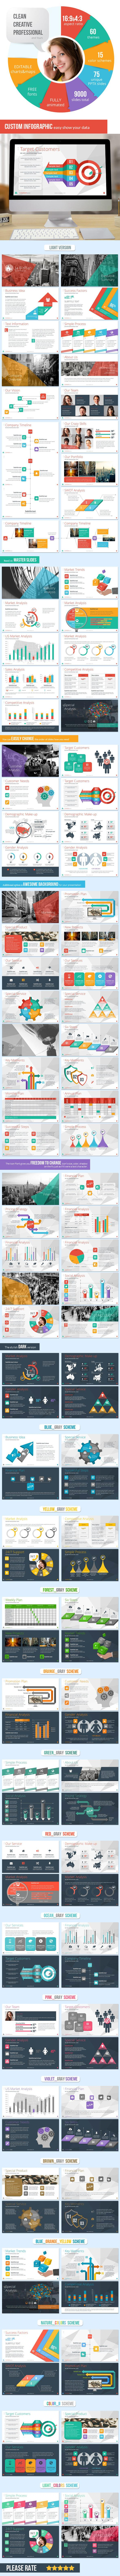 Business Plan PowerPoint Presentation Template